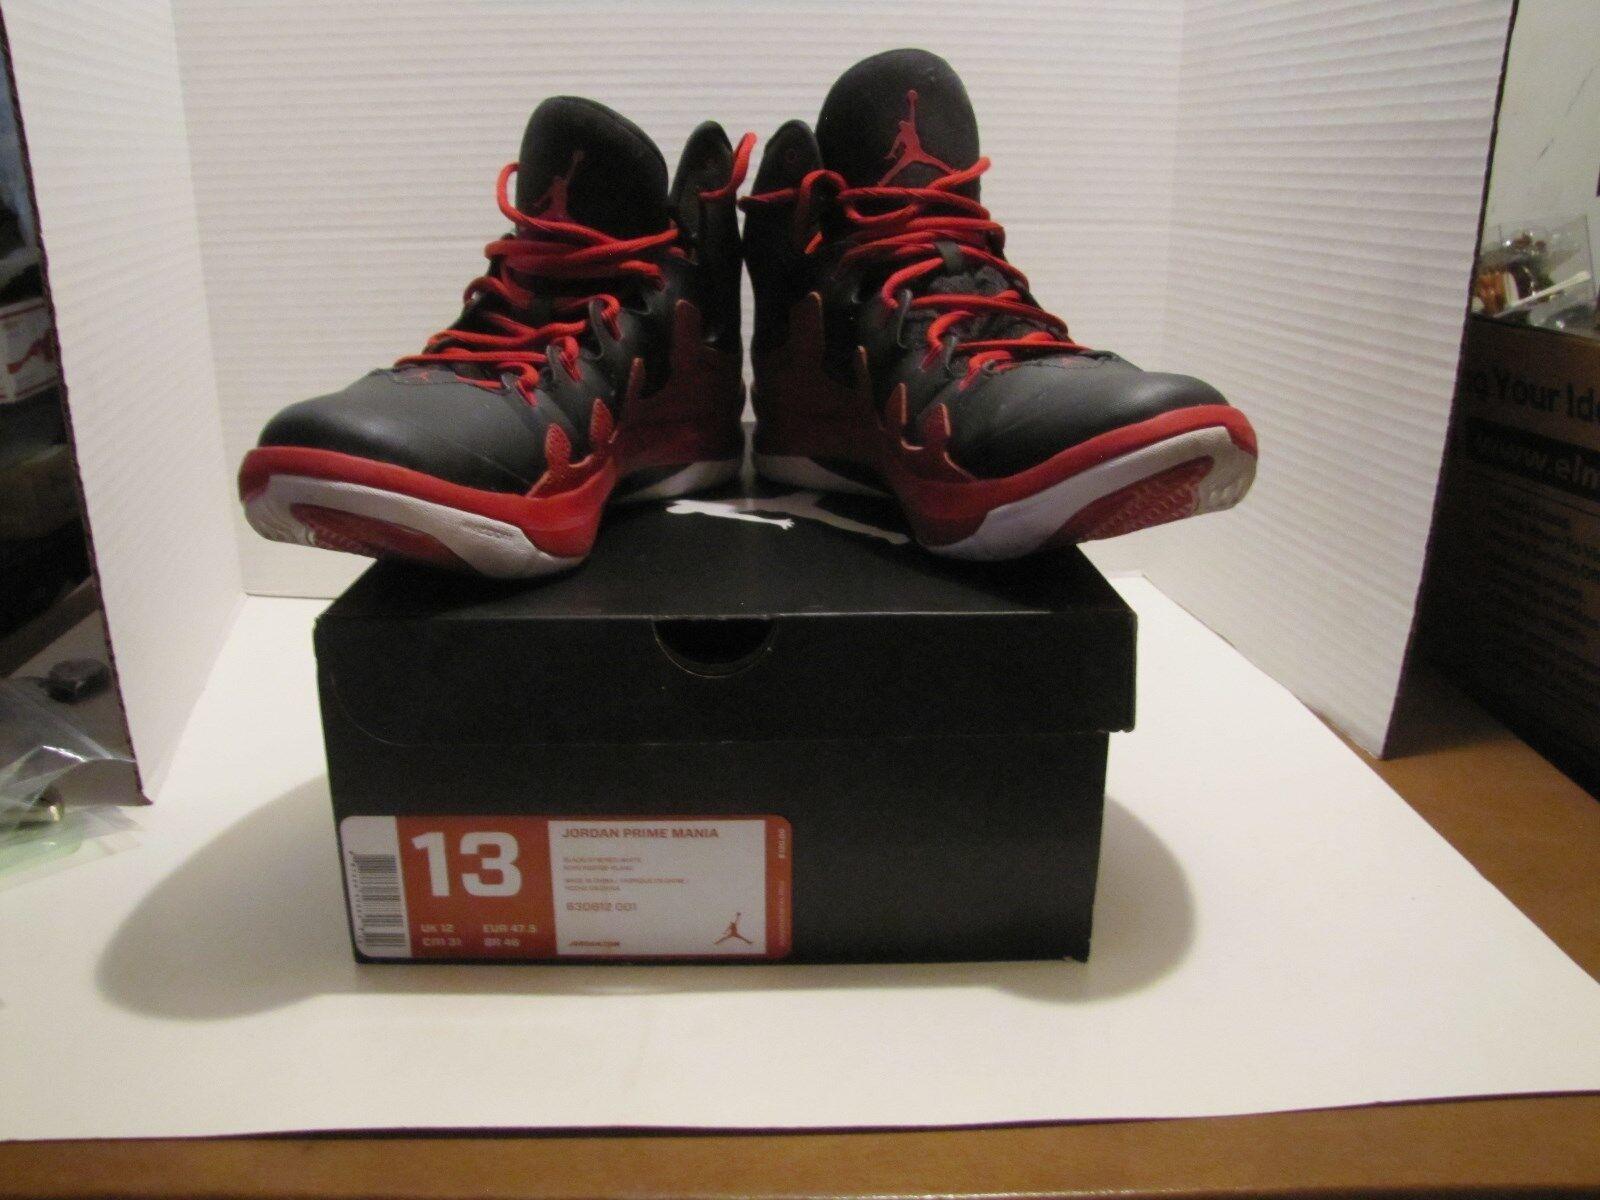 PREOWNED NIKE AIR JORDAN JORDAN PRIME MANIA BLACK & RED Price reduction The most popular shoes for men and women